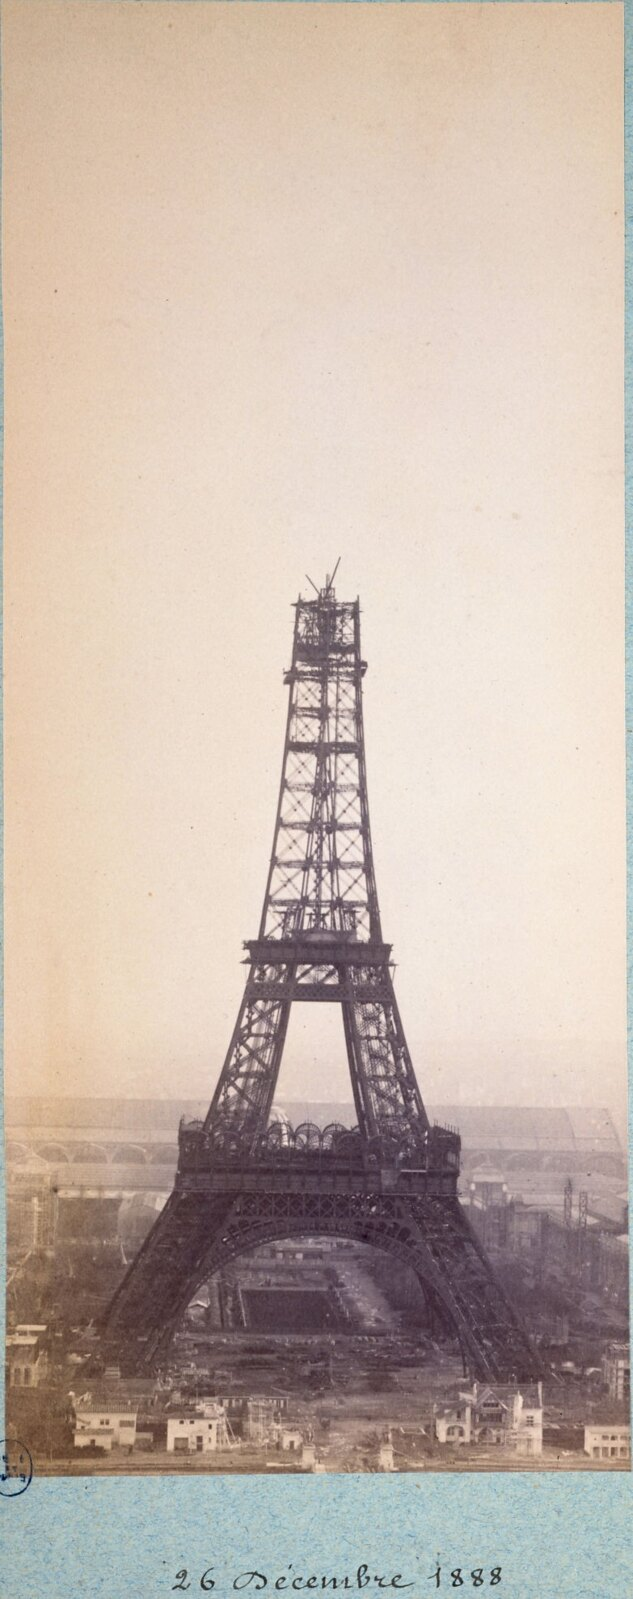 13. 1888. 26 декабря